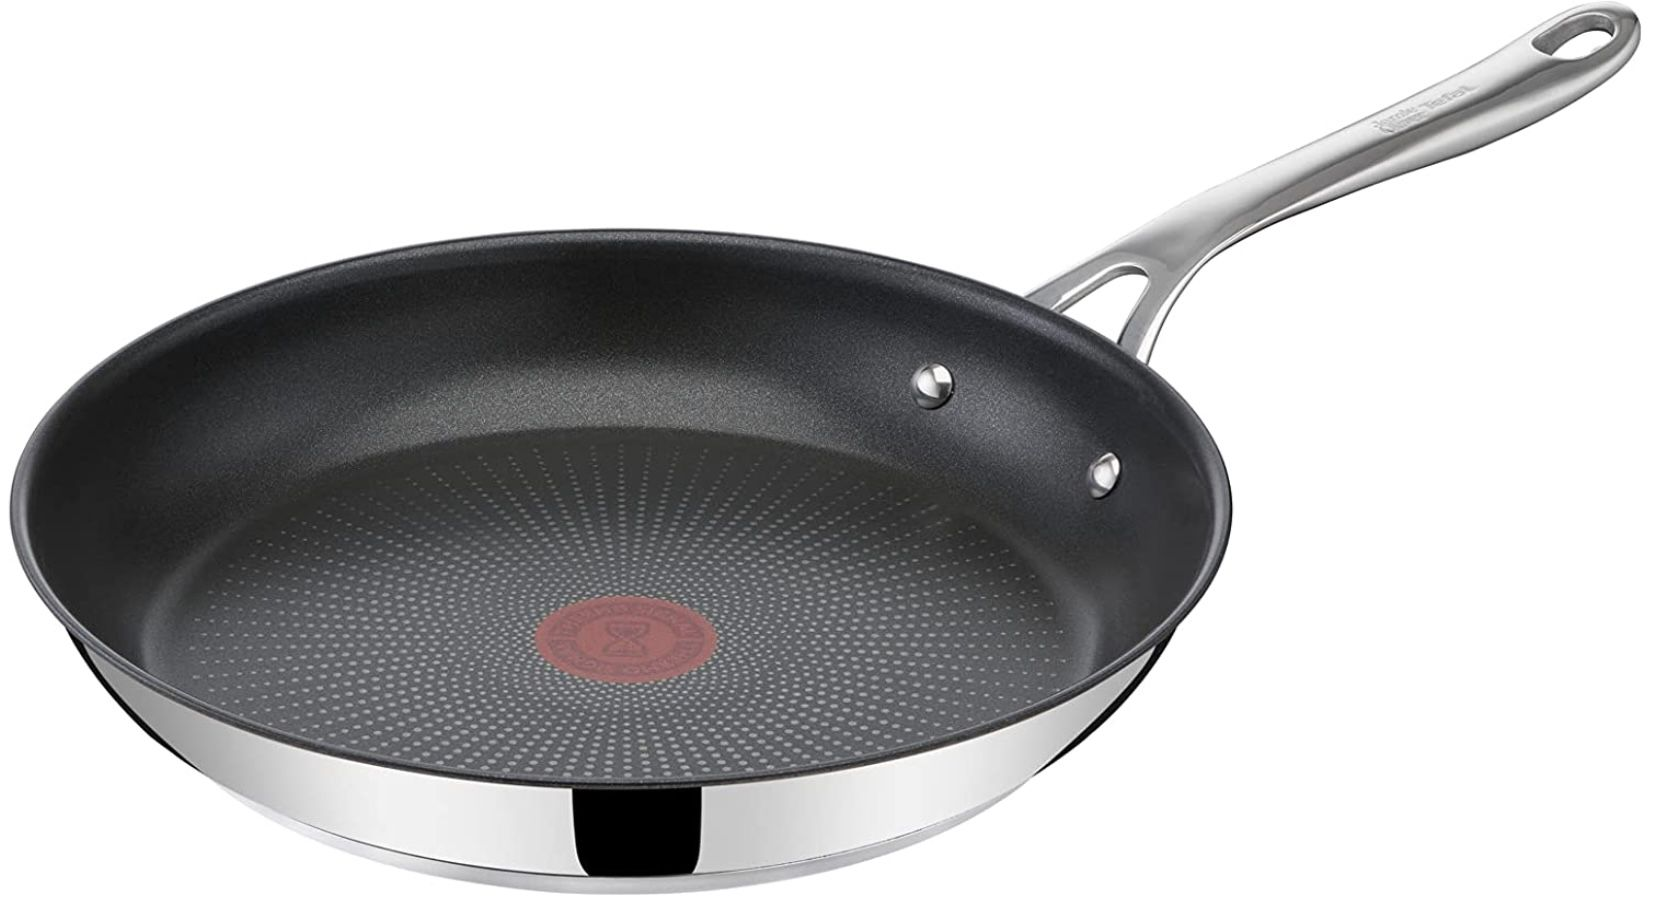 Tefal E30404 Jamie Oliver Cooks Direct On Bratpfanne für 38,98€ (statt 49€)